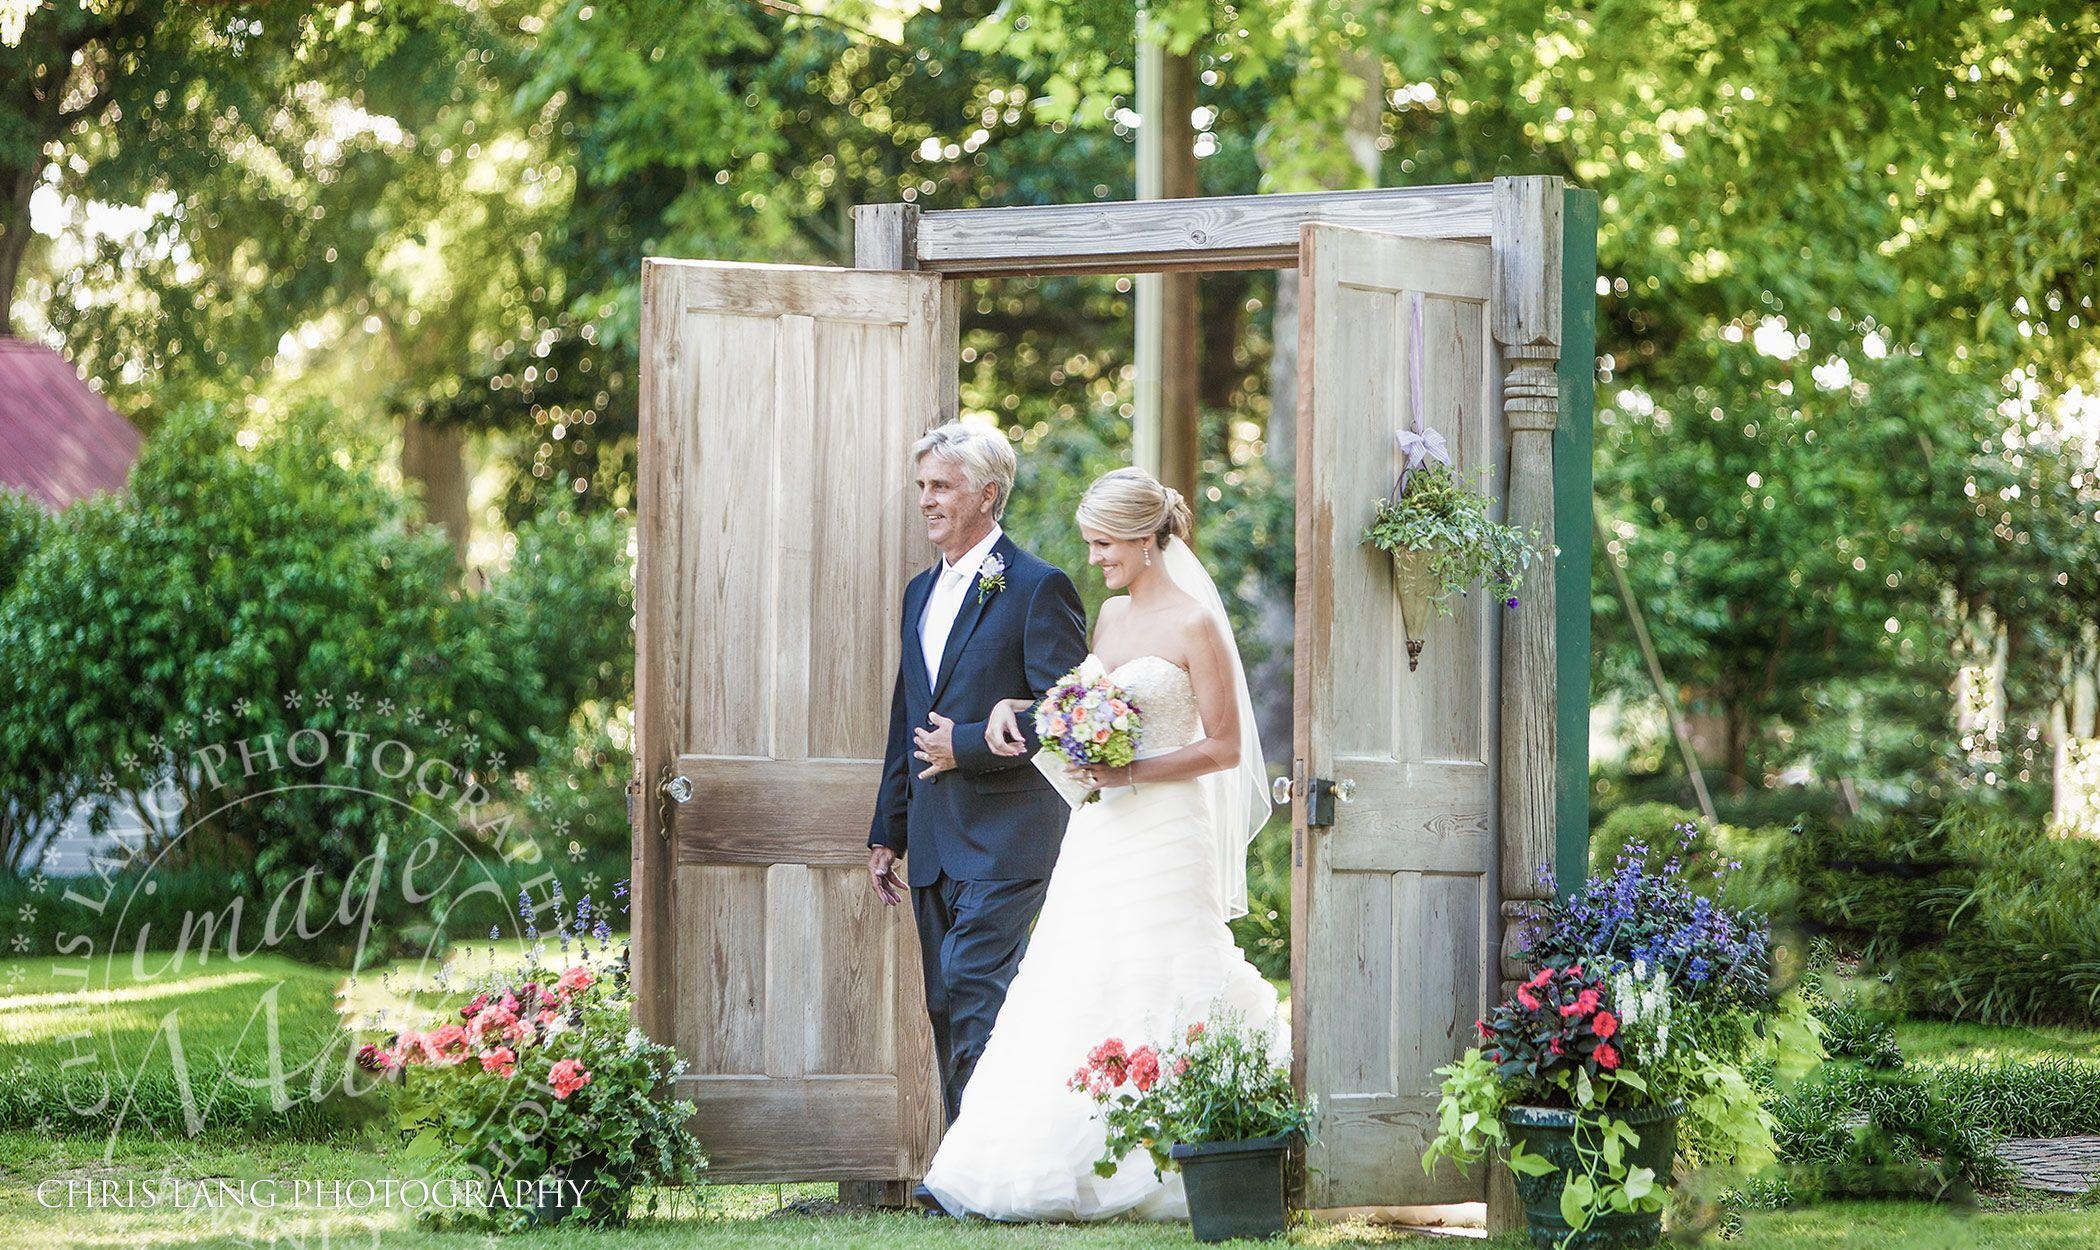 Outdoor Wedding- cute unique idea with doors to enter the ...